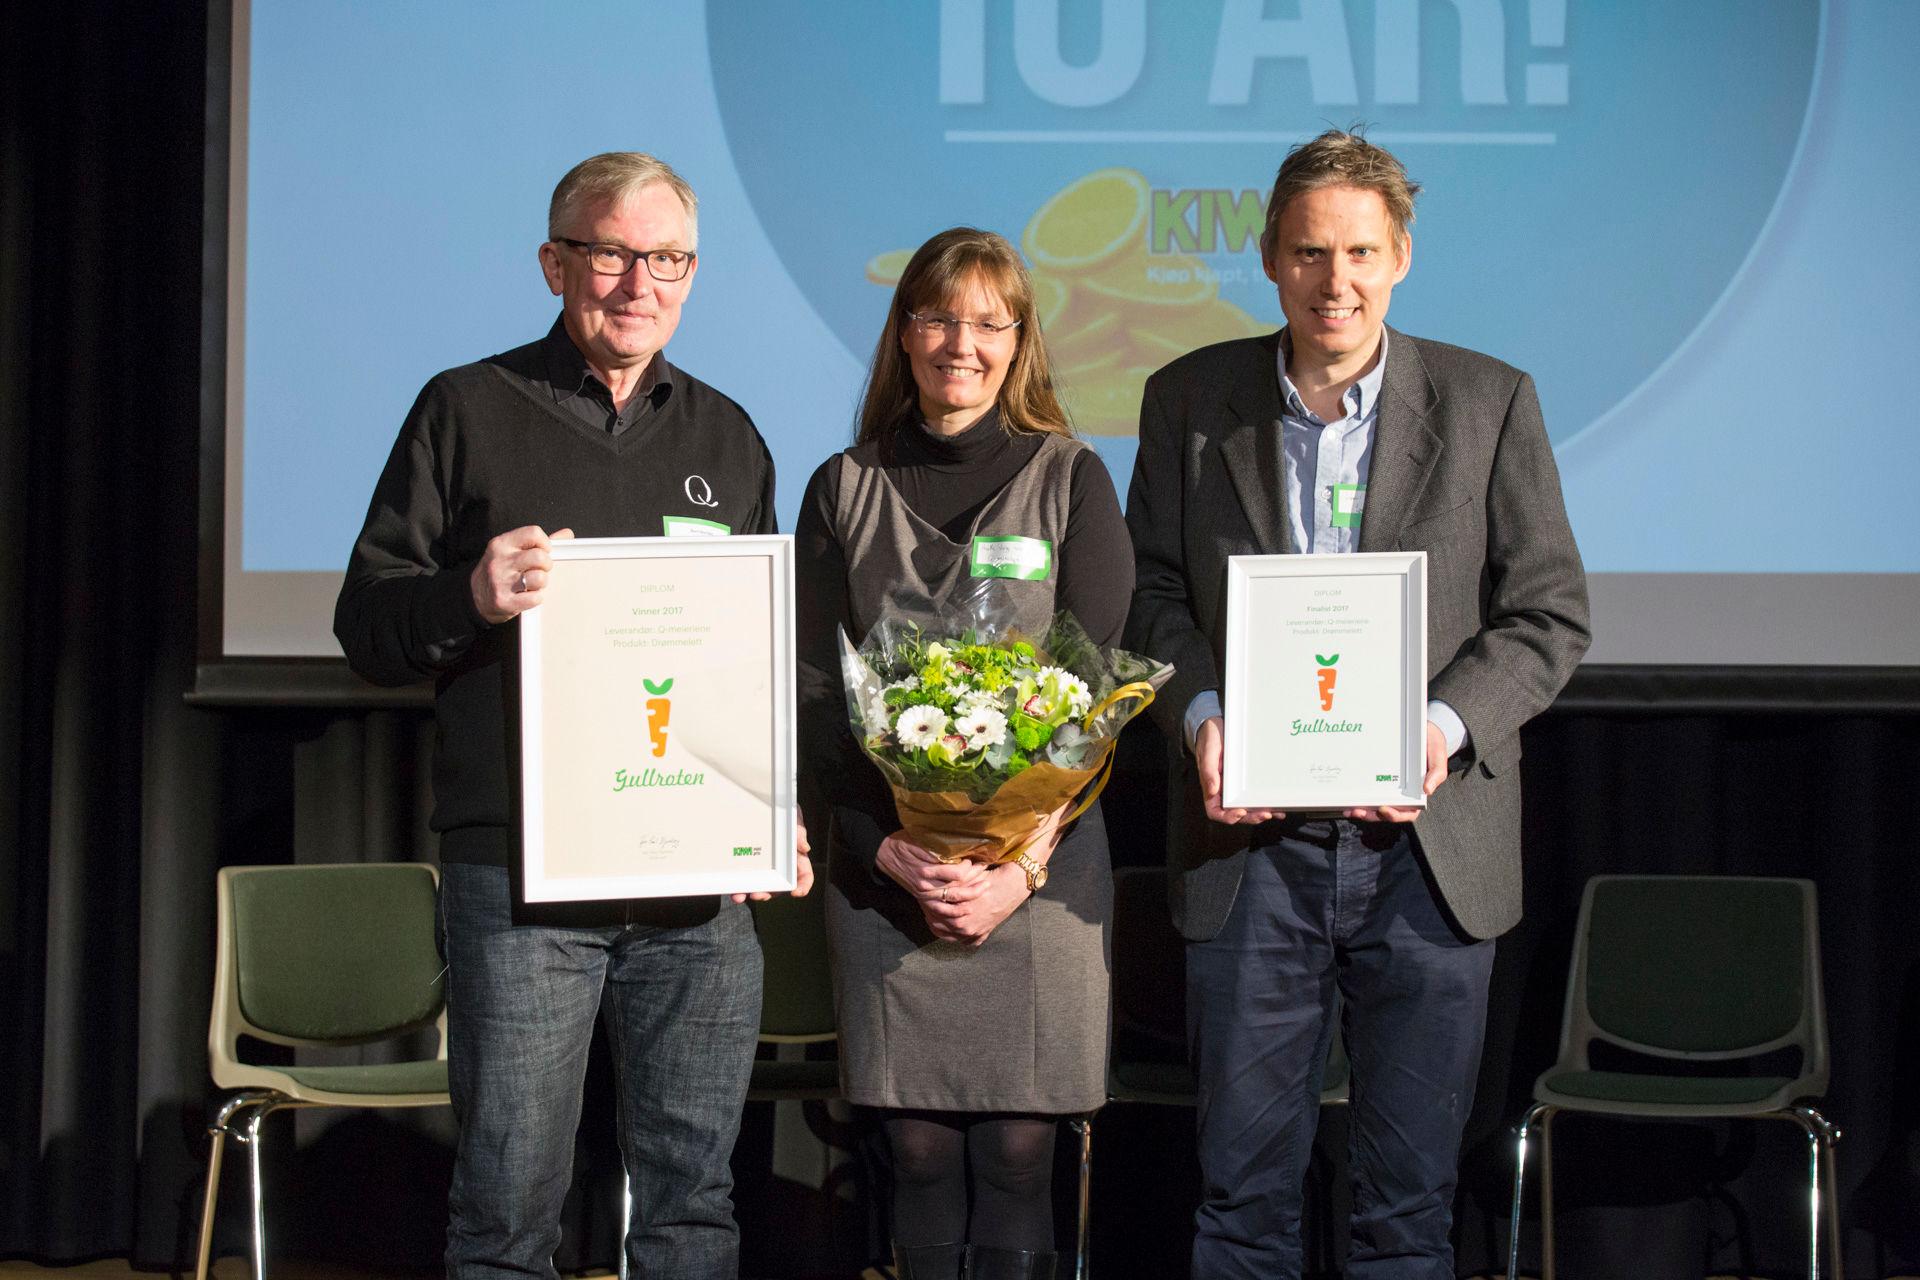 Q-meierienes «Drømmelett» vant sunnhetsprisen GULLroten.